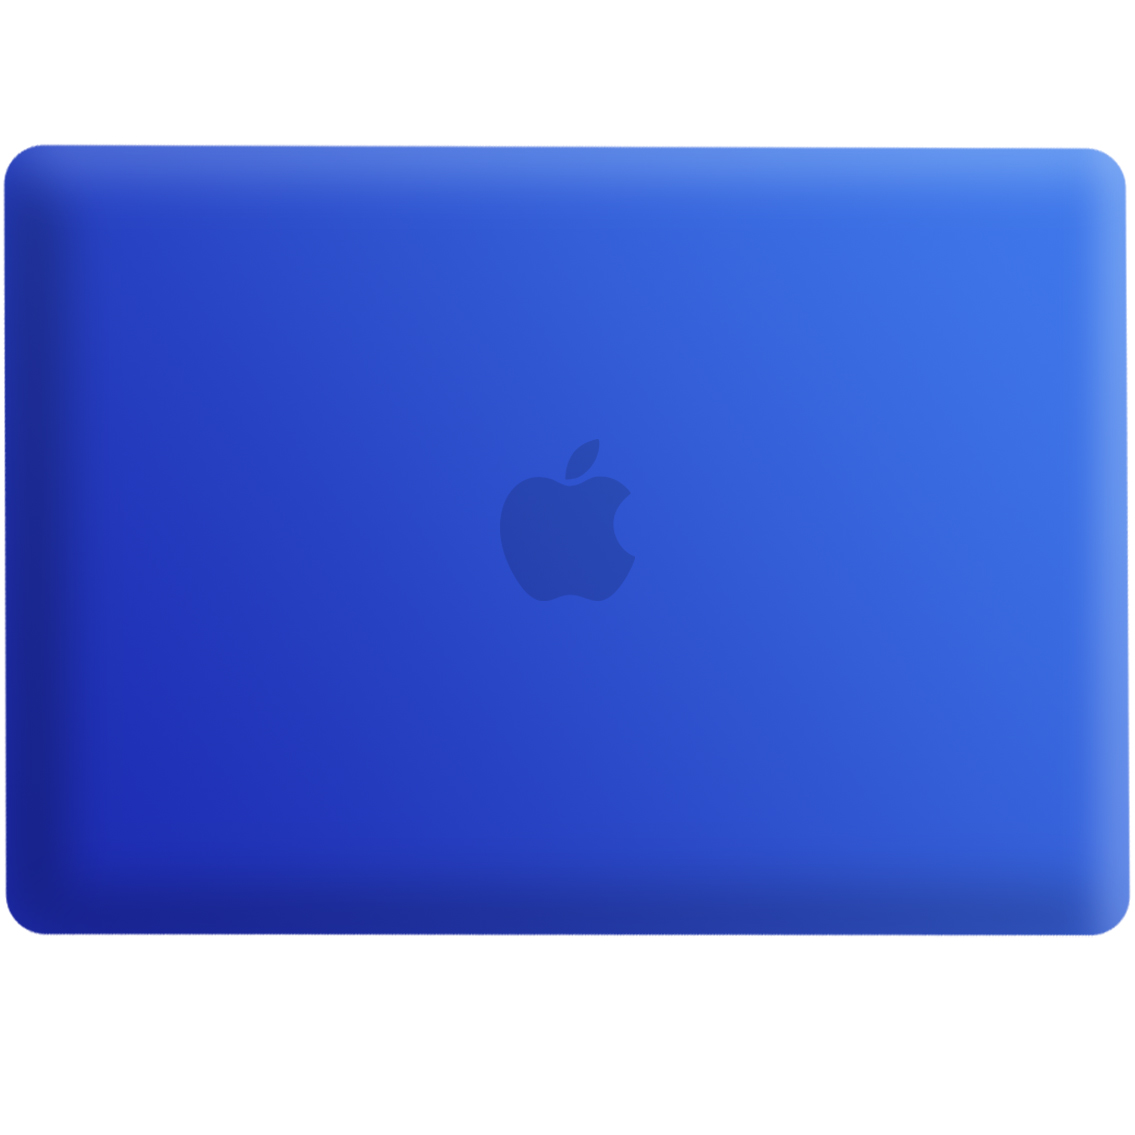 Neon Party Macbook Case - Pro 15''